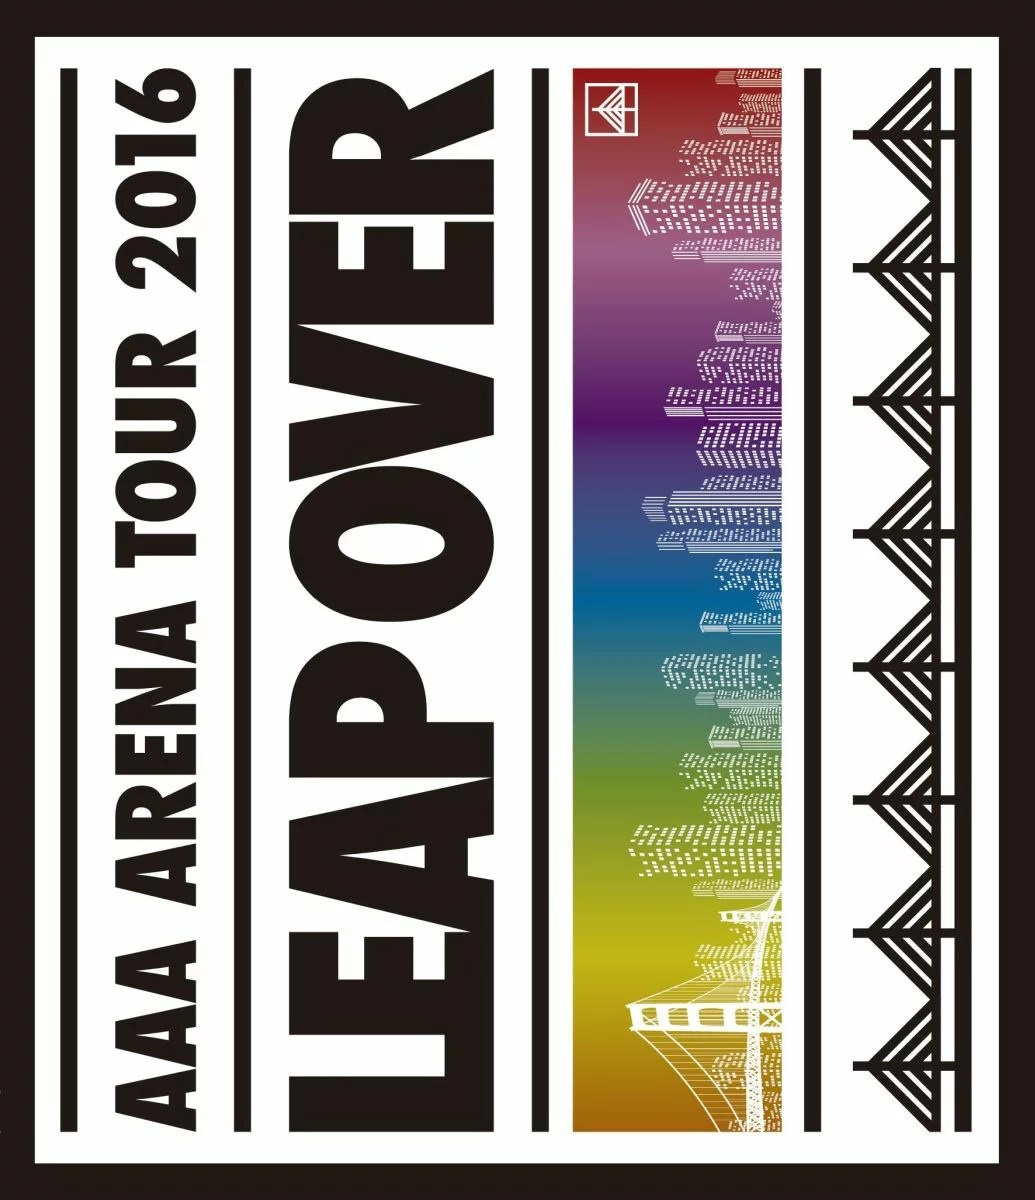 AAA ARENA TOUR 2016 - LEAP OVER -(通常盤 Blu-ray Disc スマプラ対応)【Blu-ray】 [ AAA ]